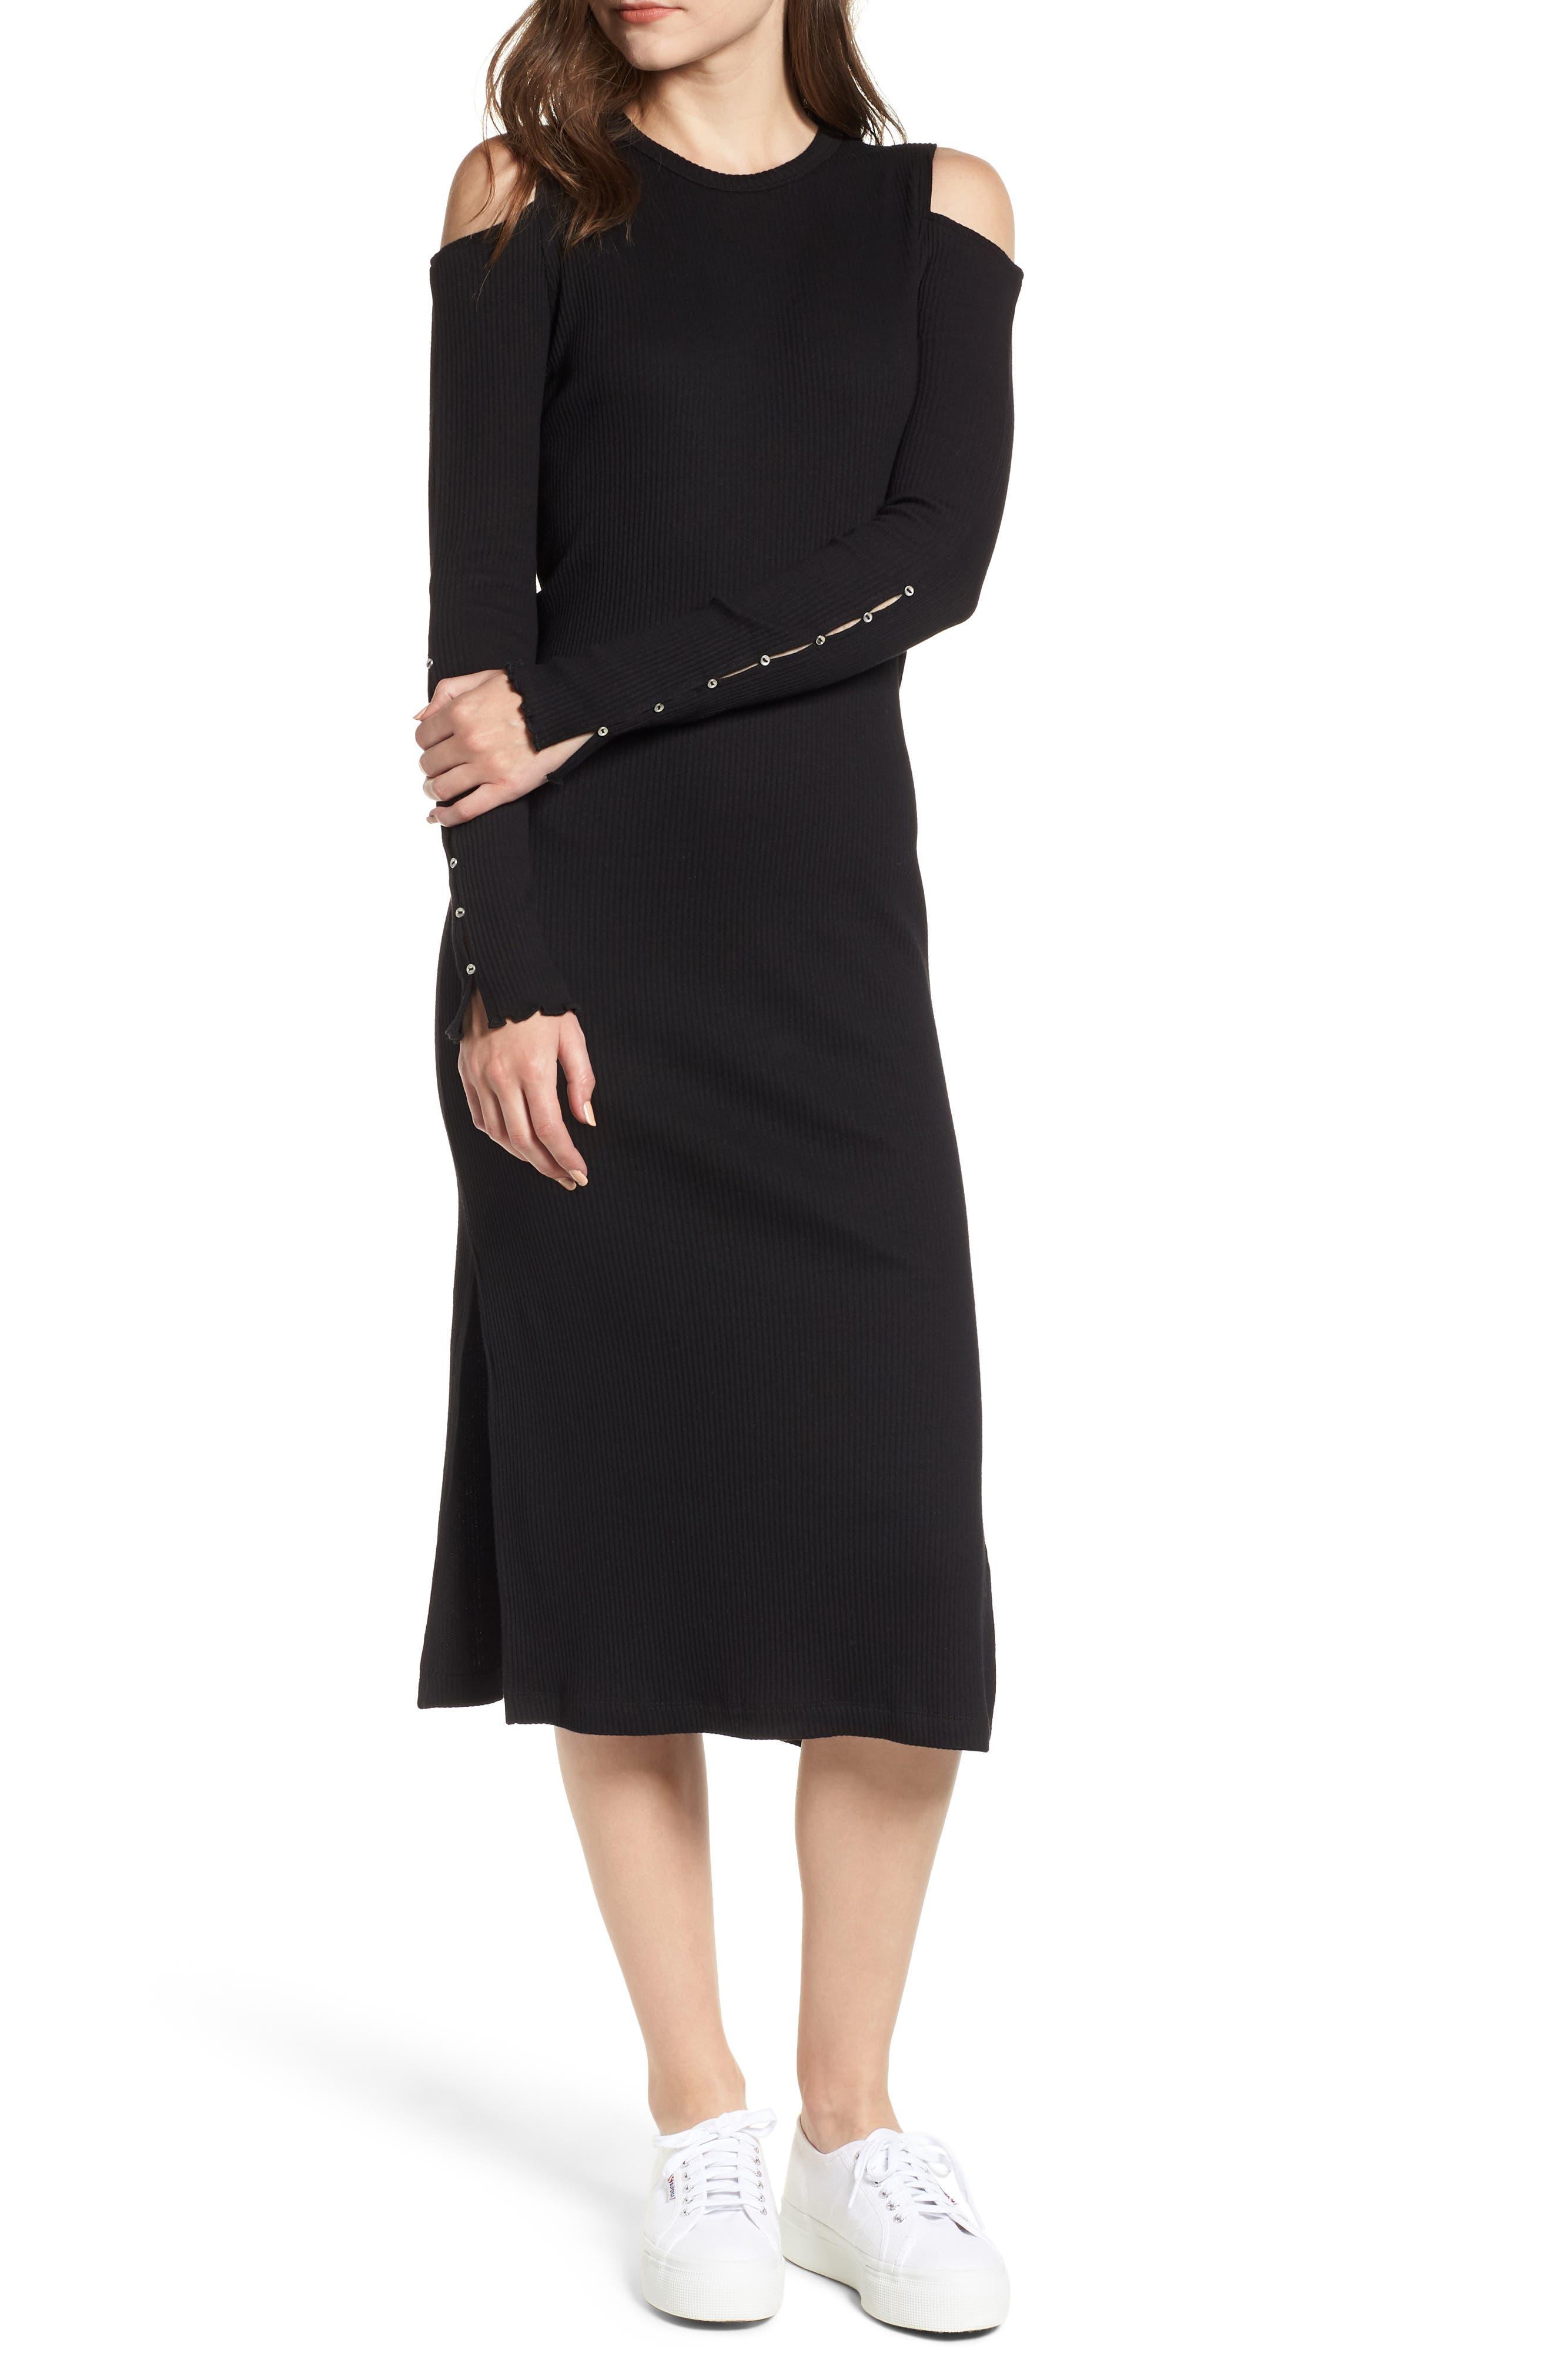 CURRENT ELLIOTT Current/Elliott The Going Steady Cold-Shoulder Rib-Knit Dress in Caviar